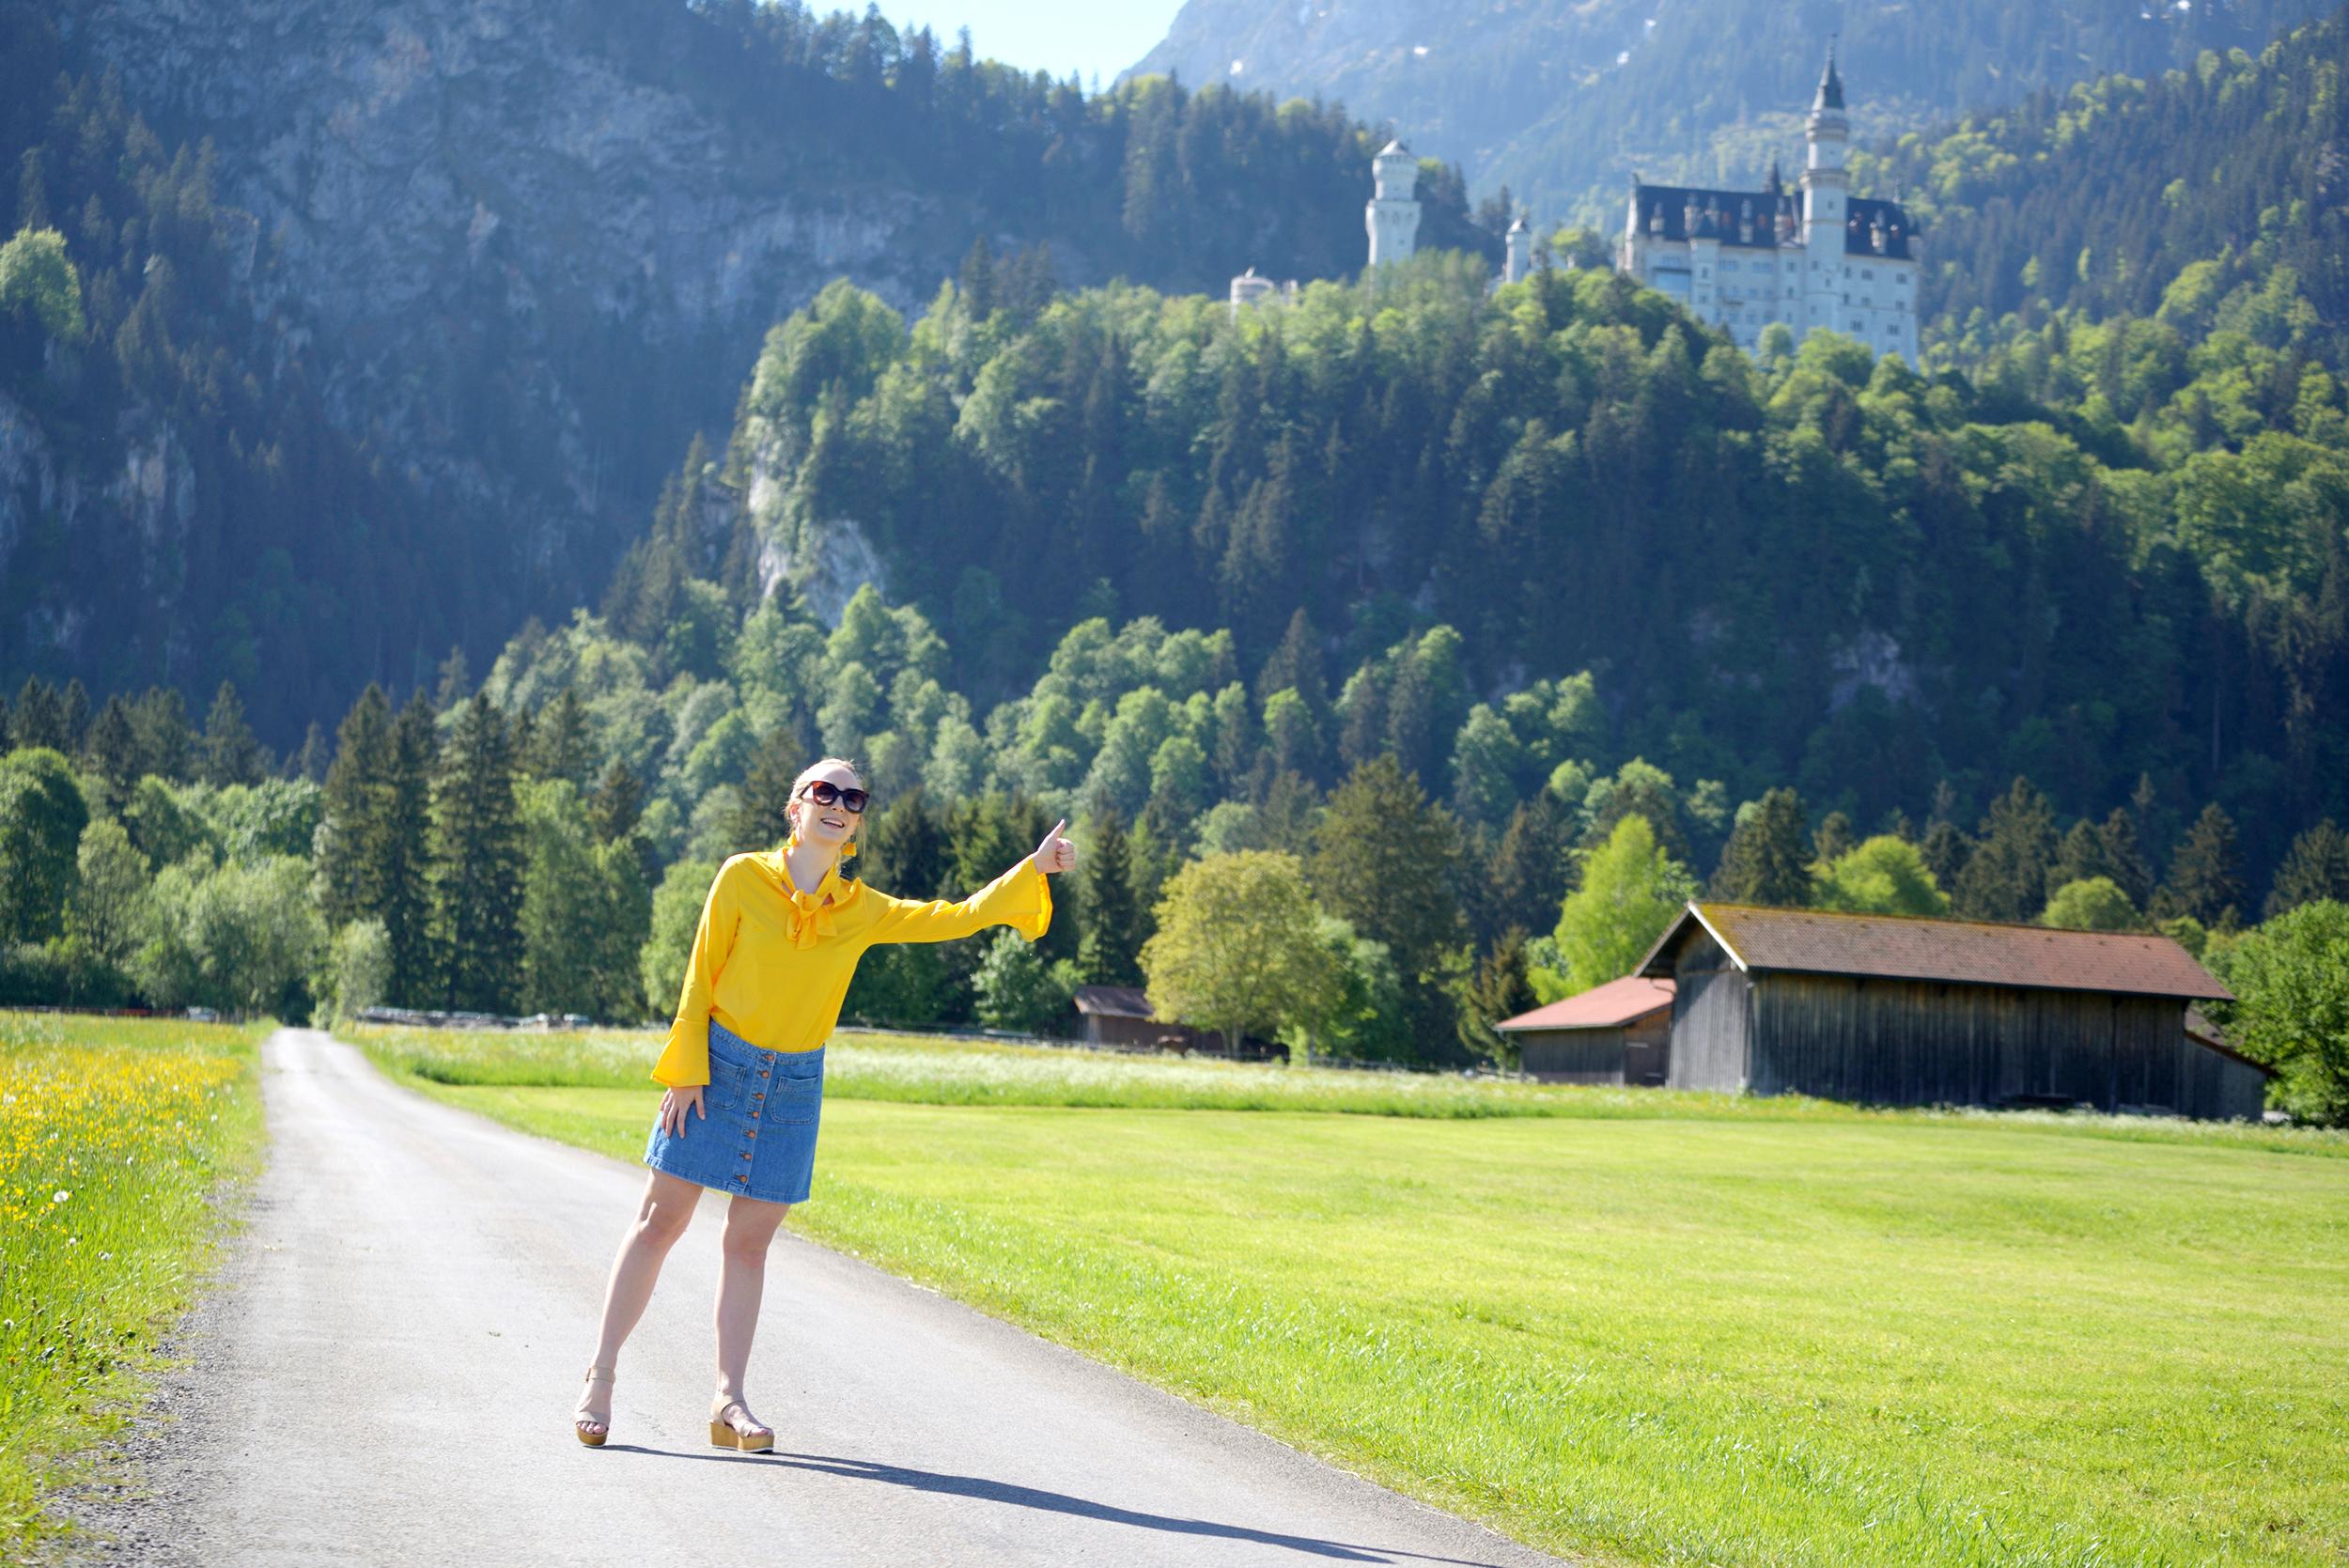 Early Summer Look in the Allgäu